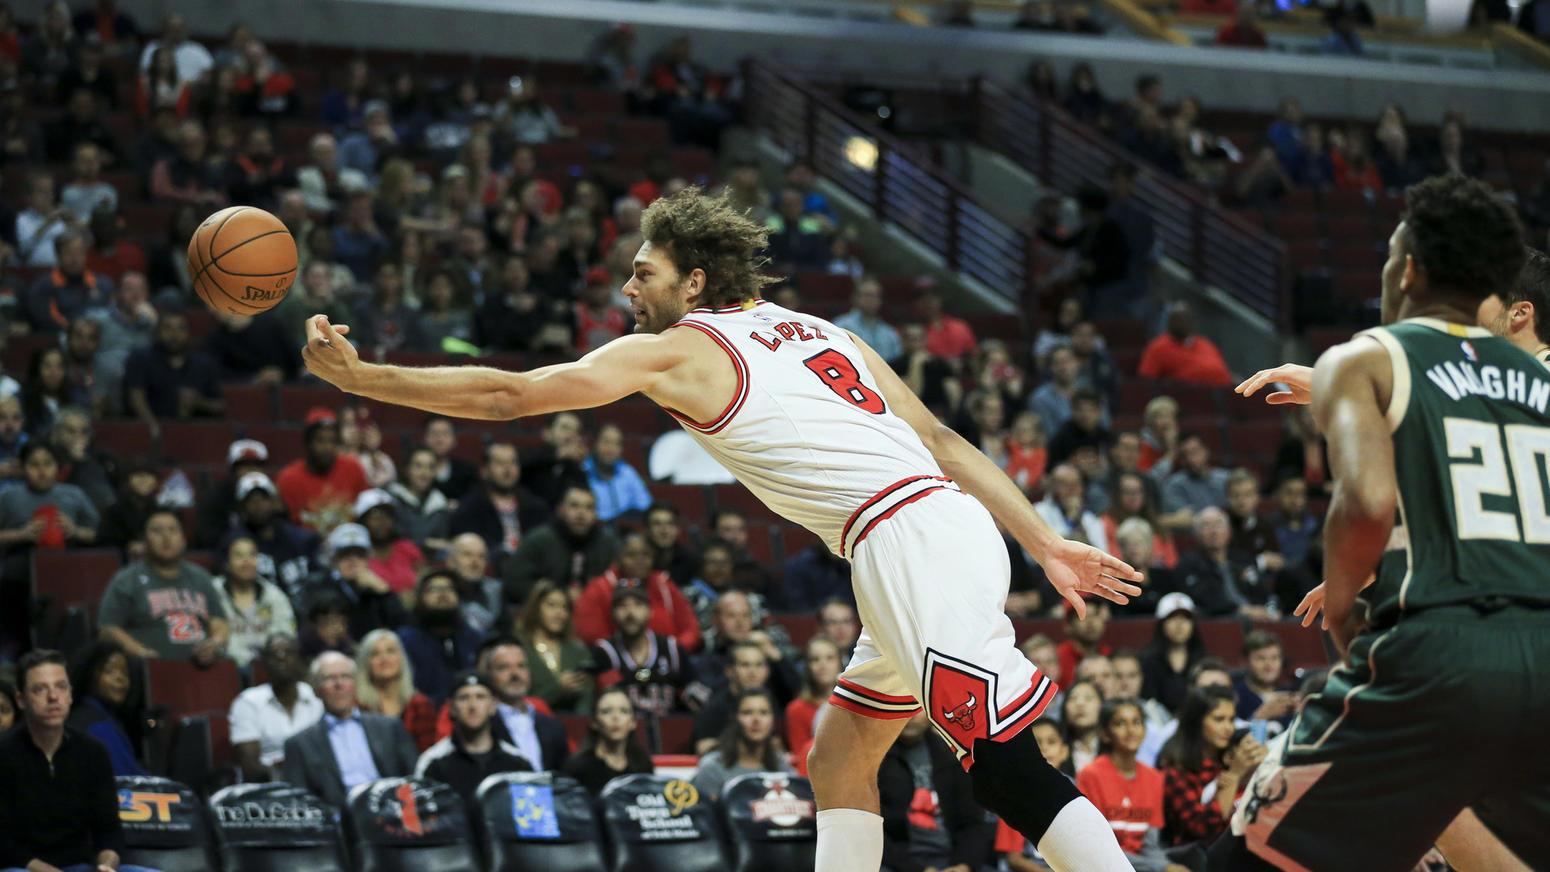 Brook-lopez-robin-Rissa Bulls-Thunder, Robin Lopez, centro dei Chicago Bulls